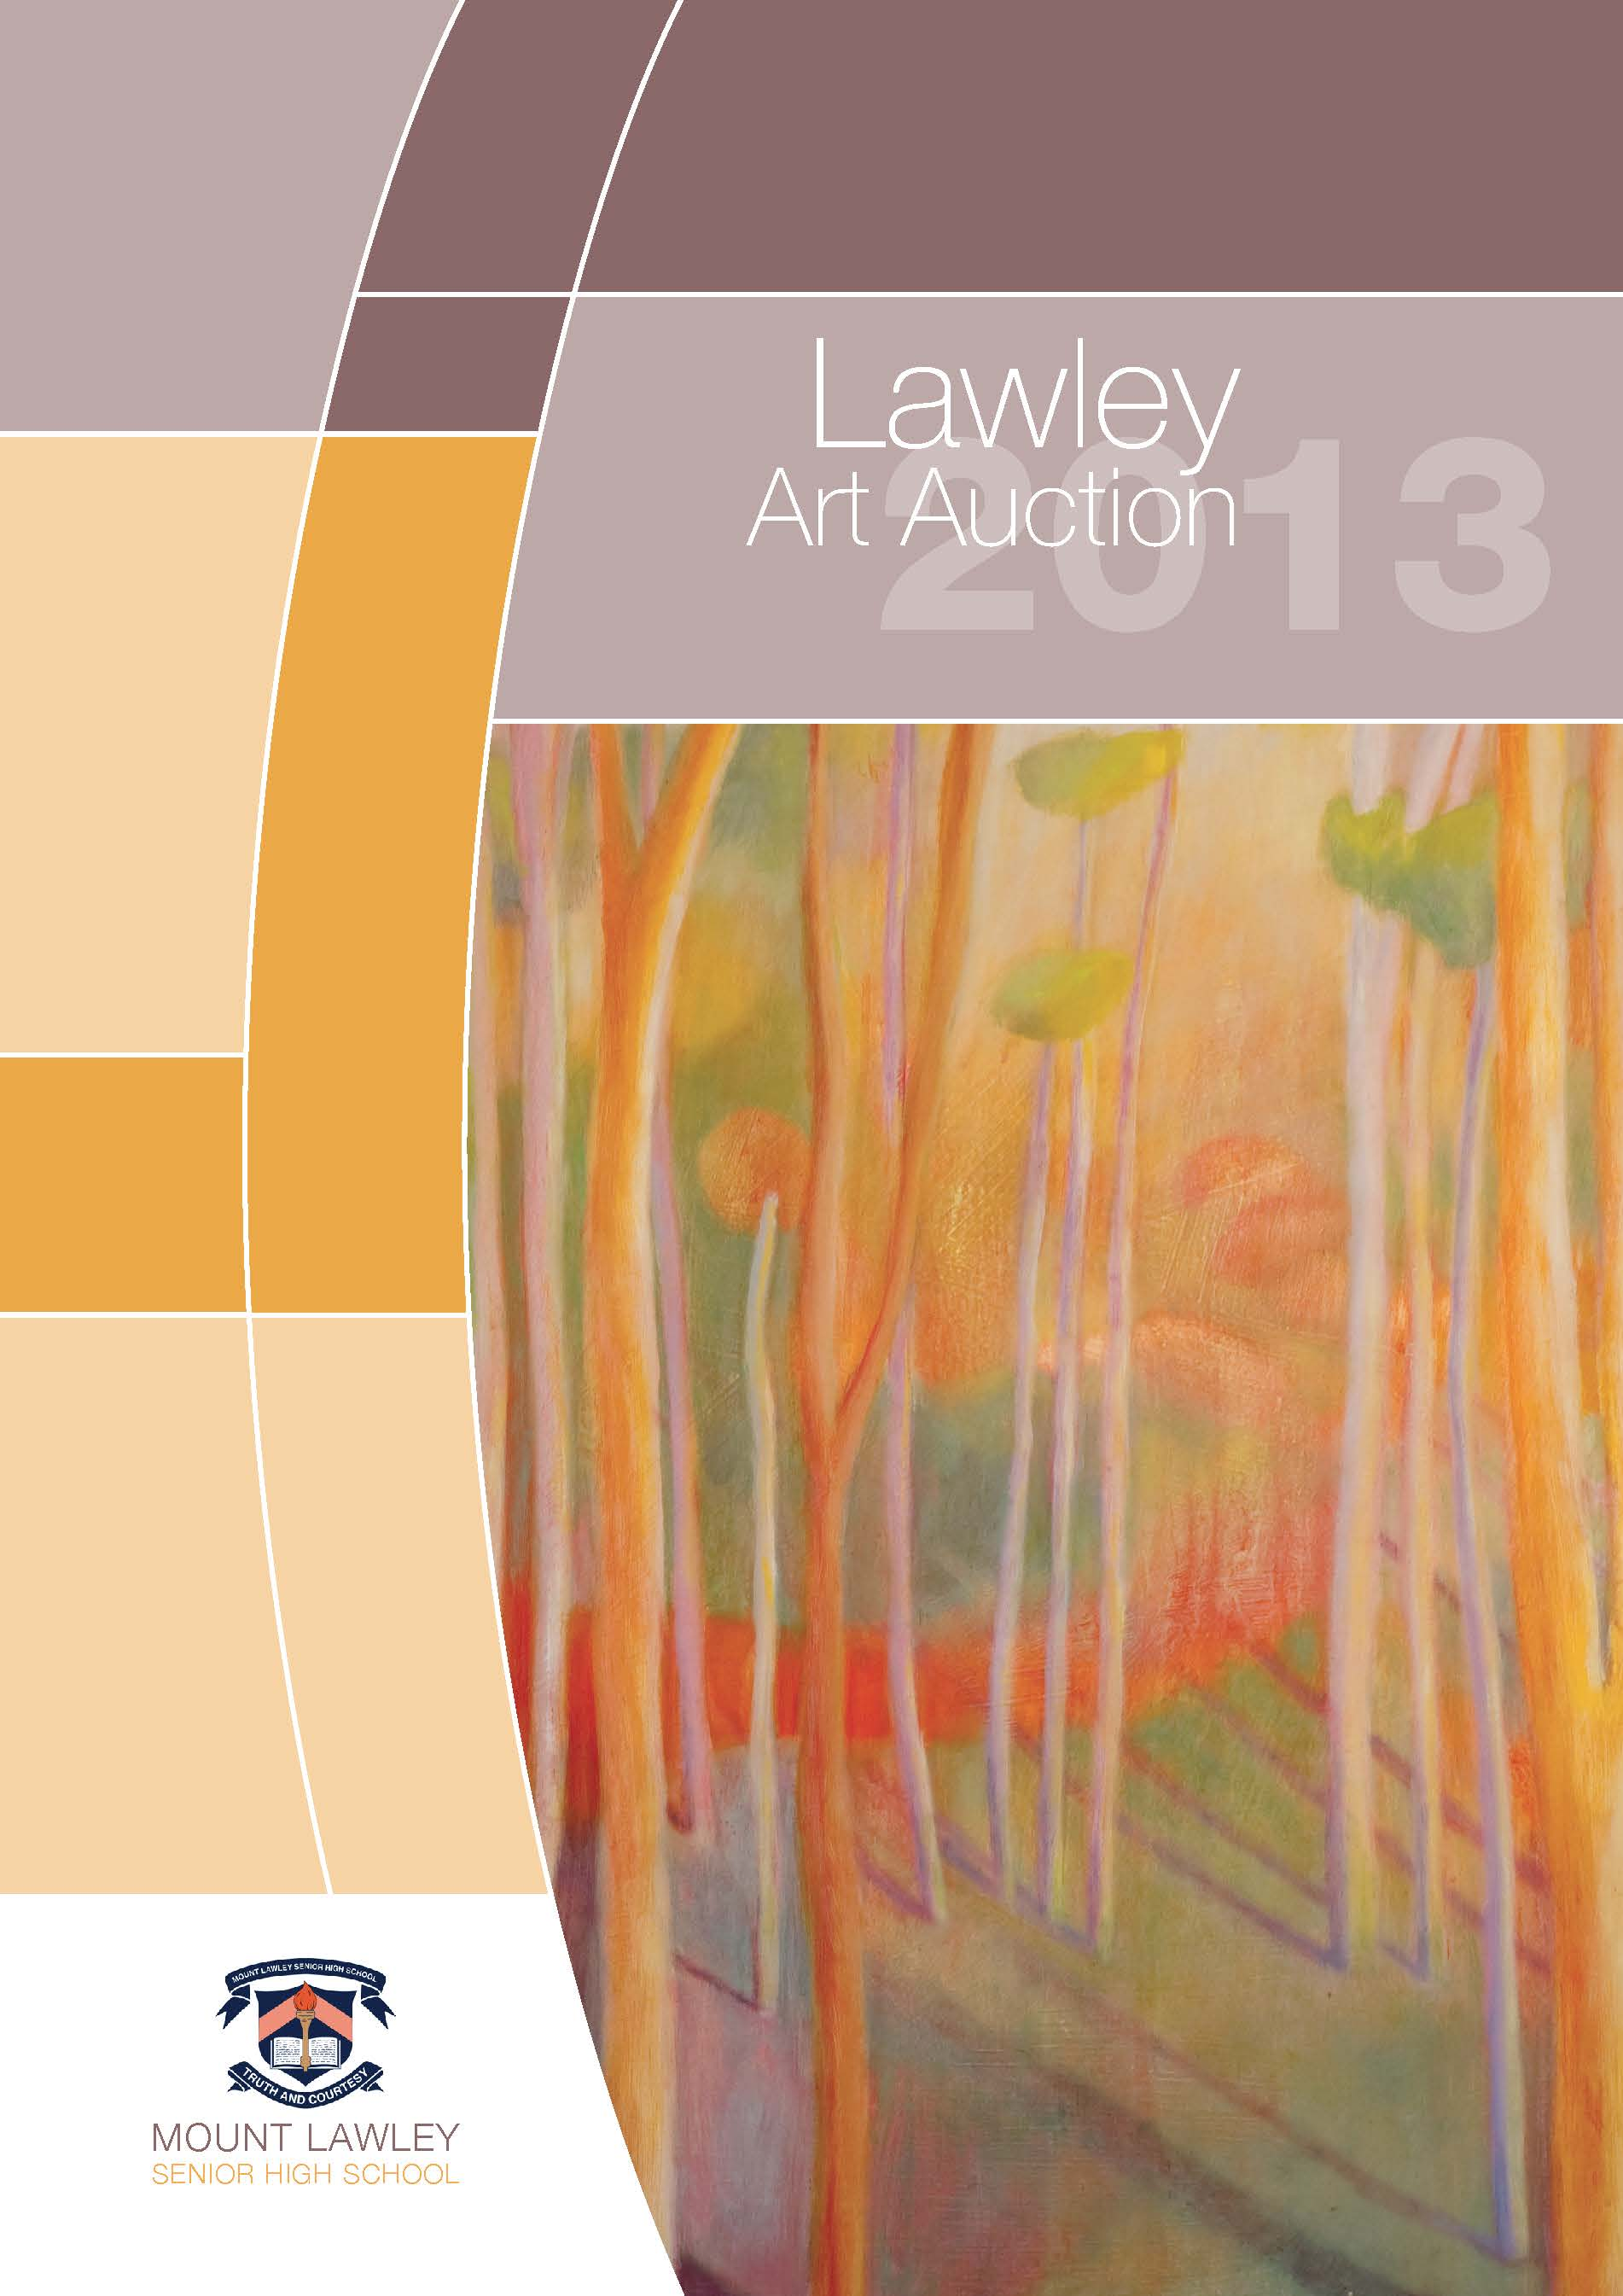 MLSHS Art Auction Catalogue 2013_Page_1